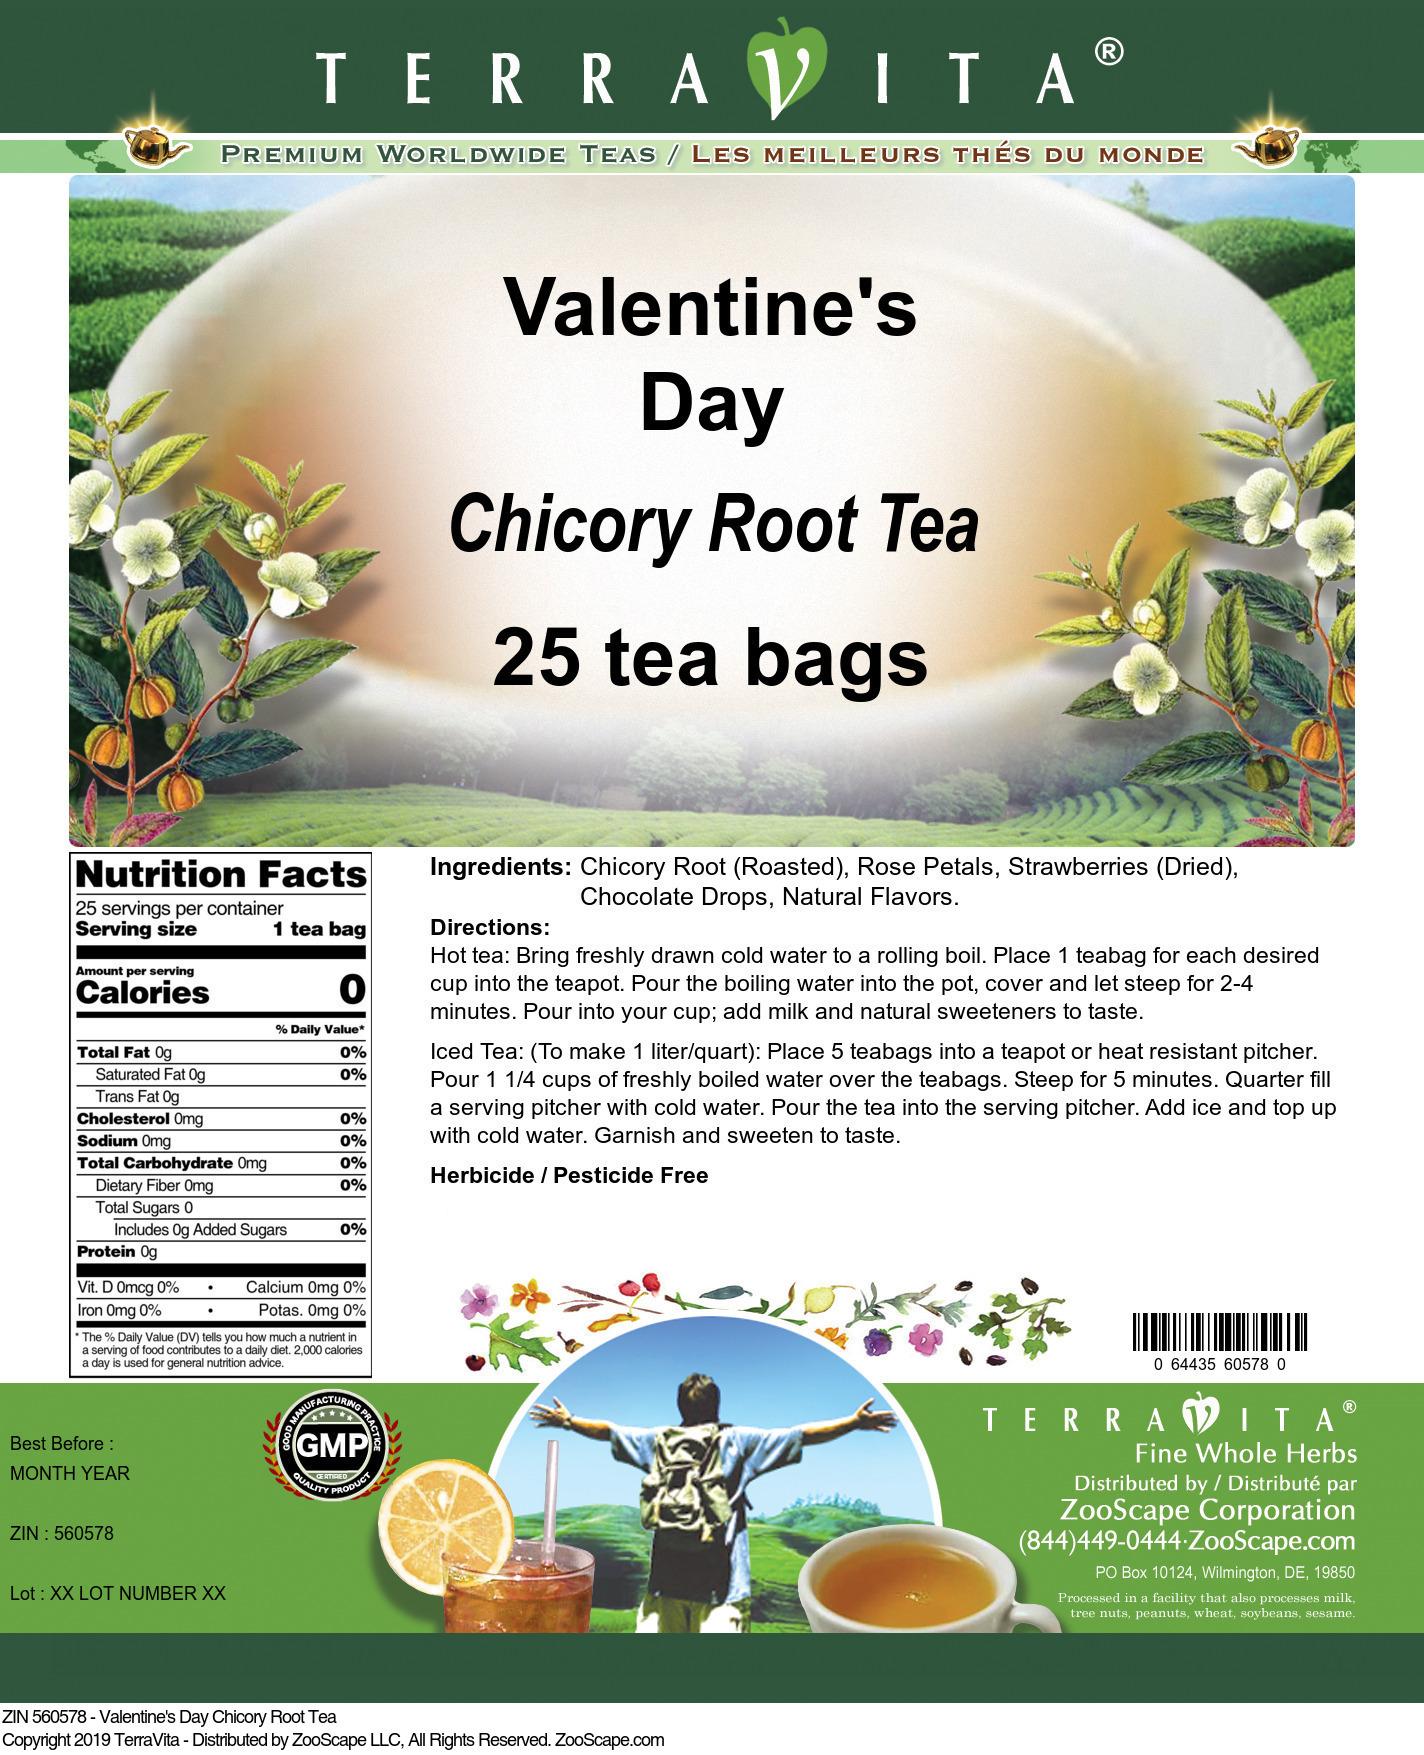 Valentine's Day Chicory Root Tea